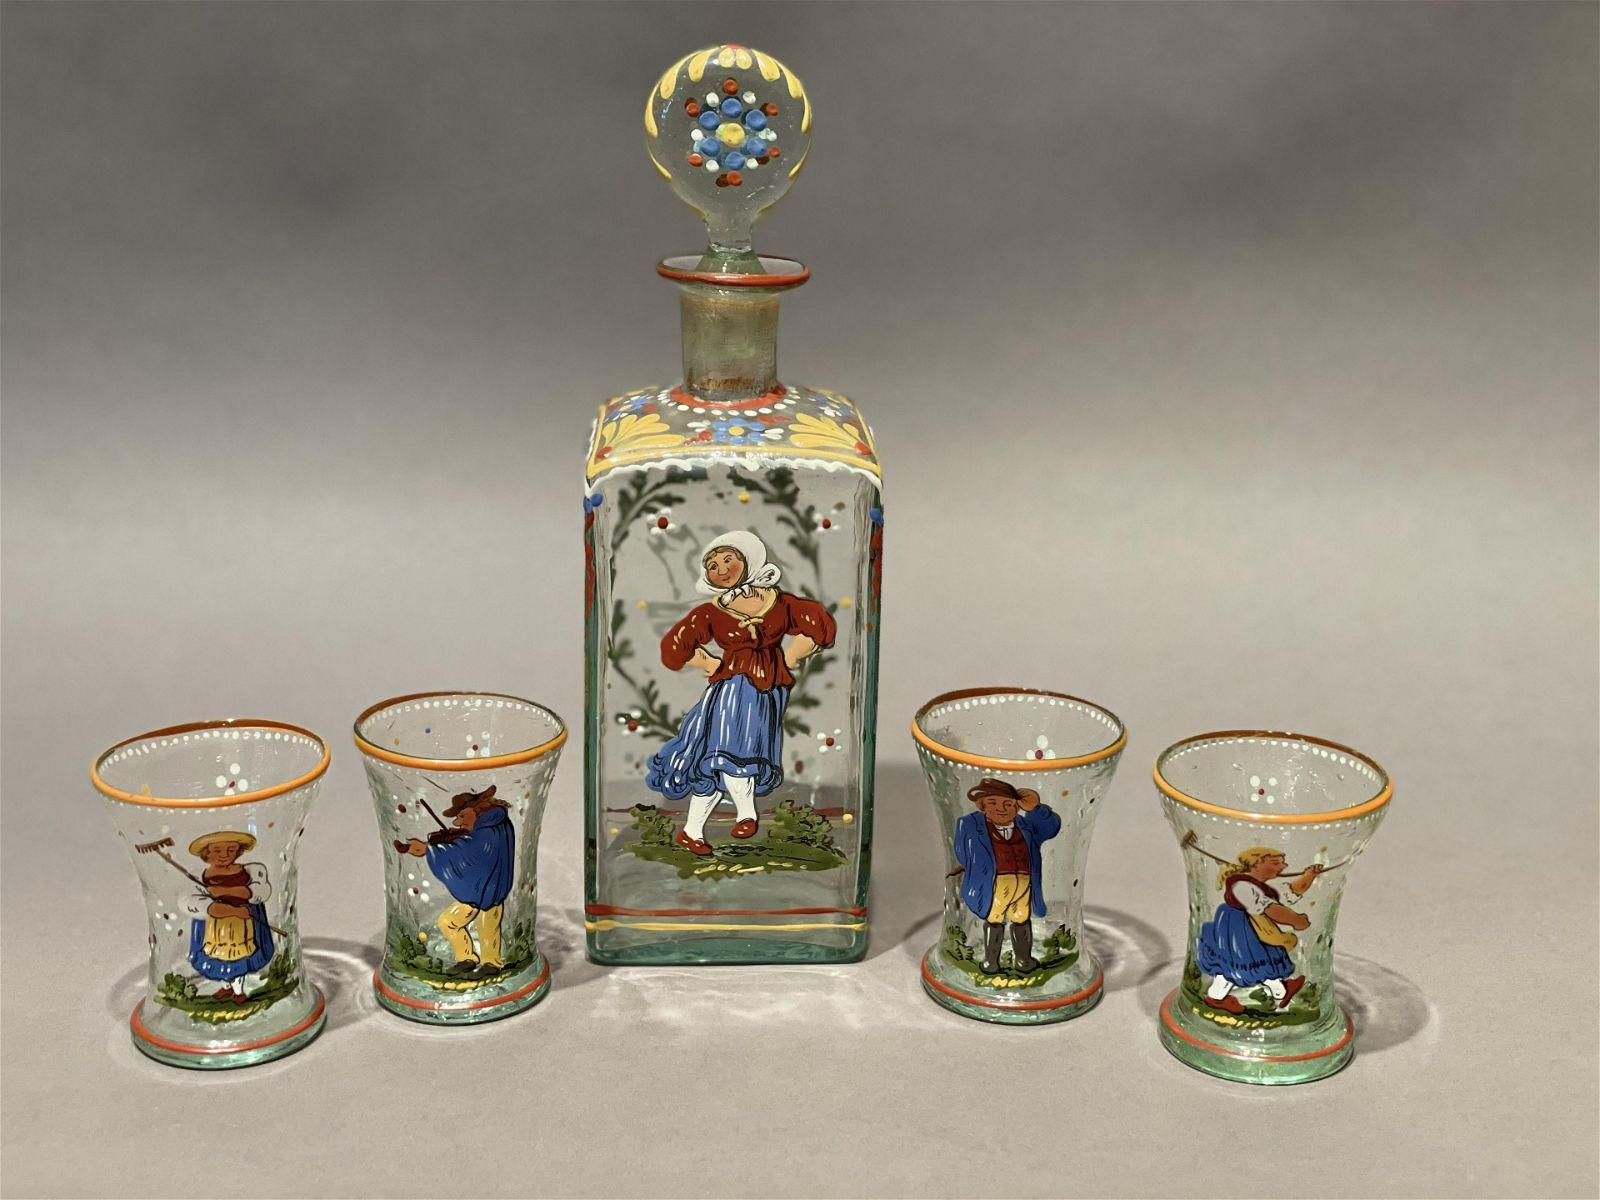 Vintage Enameled Glass Liquor Set